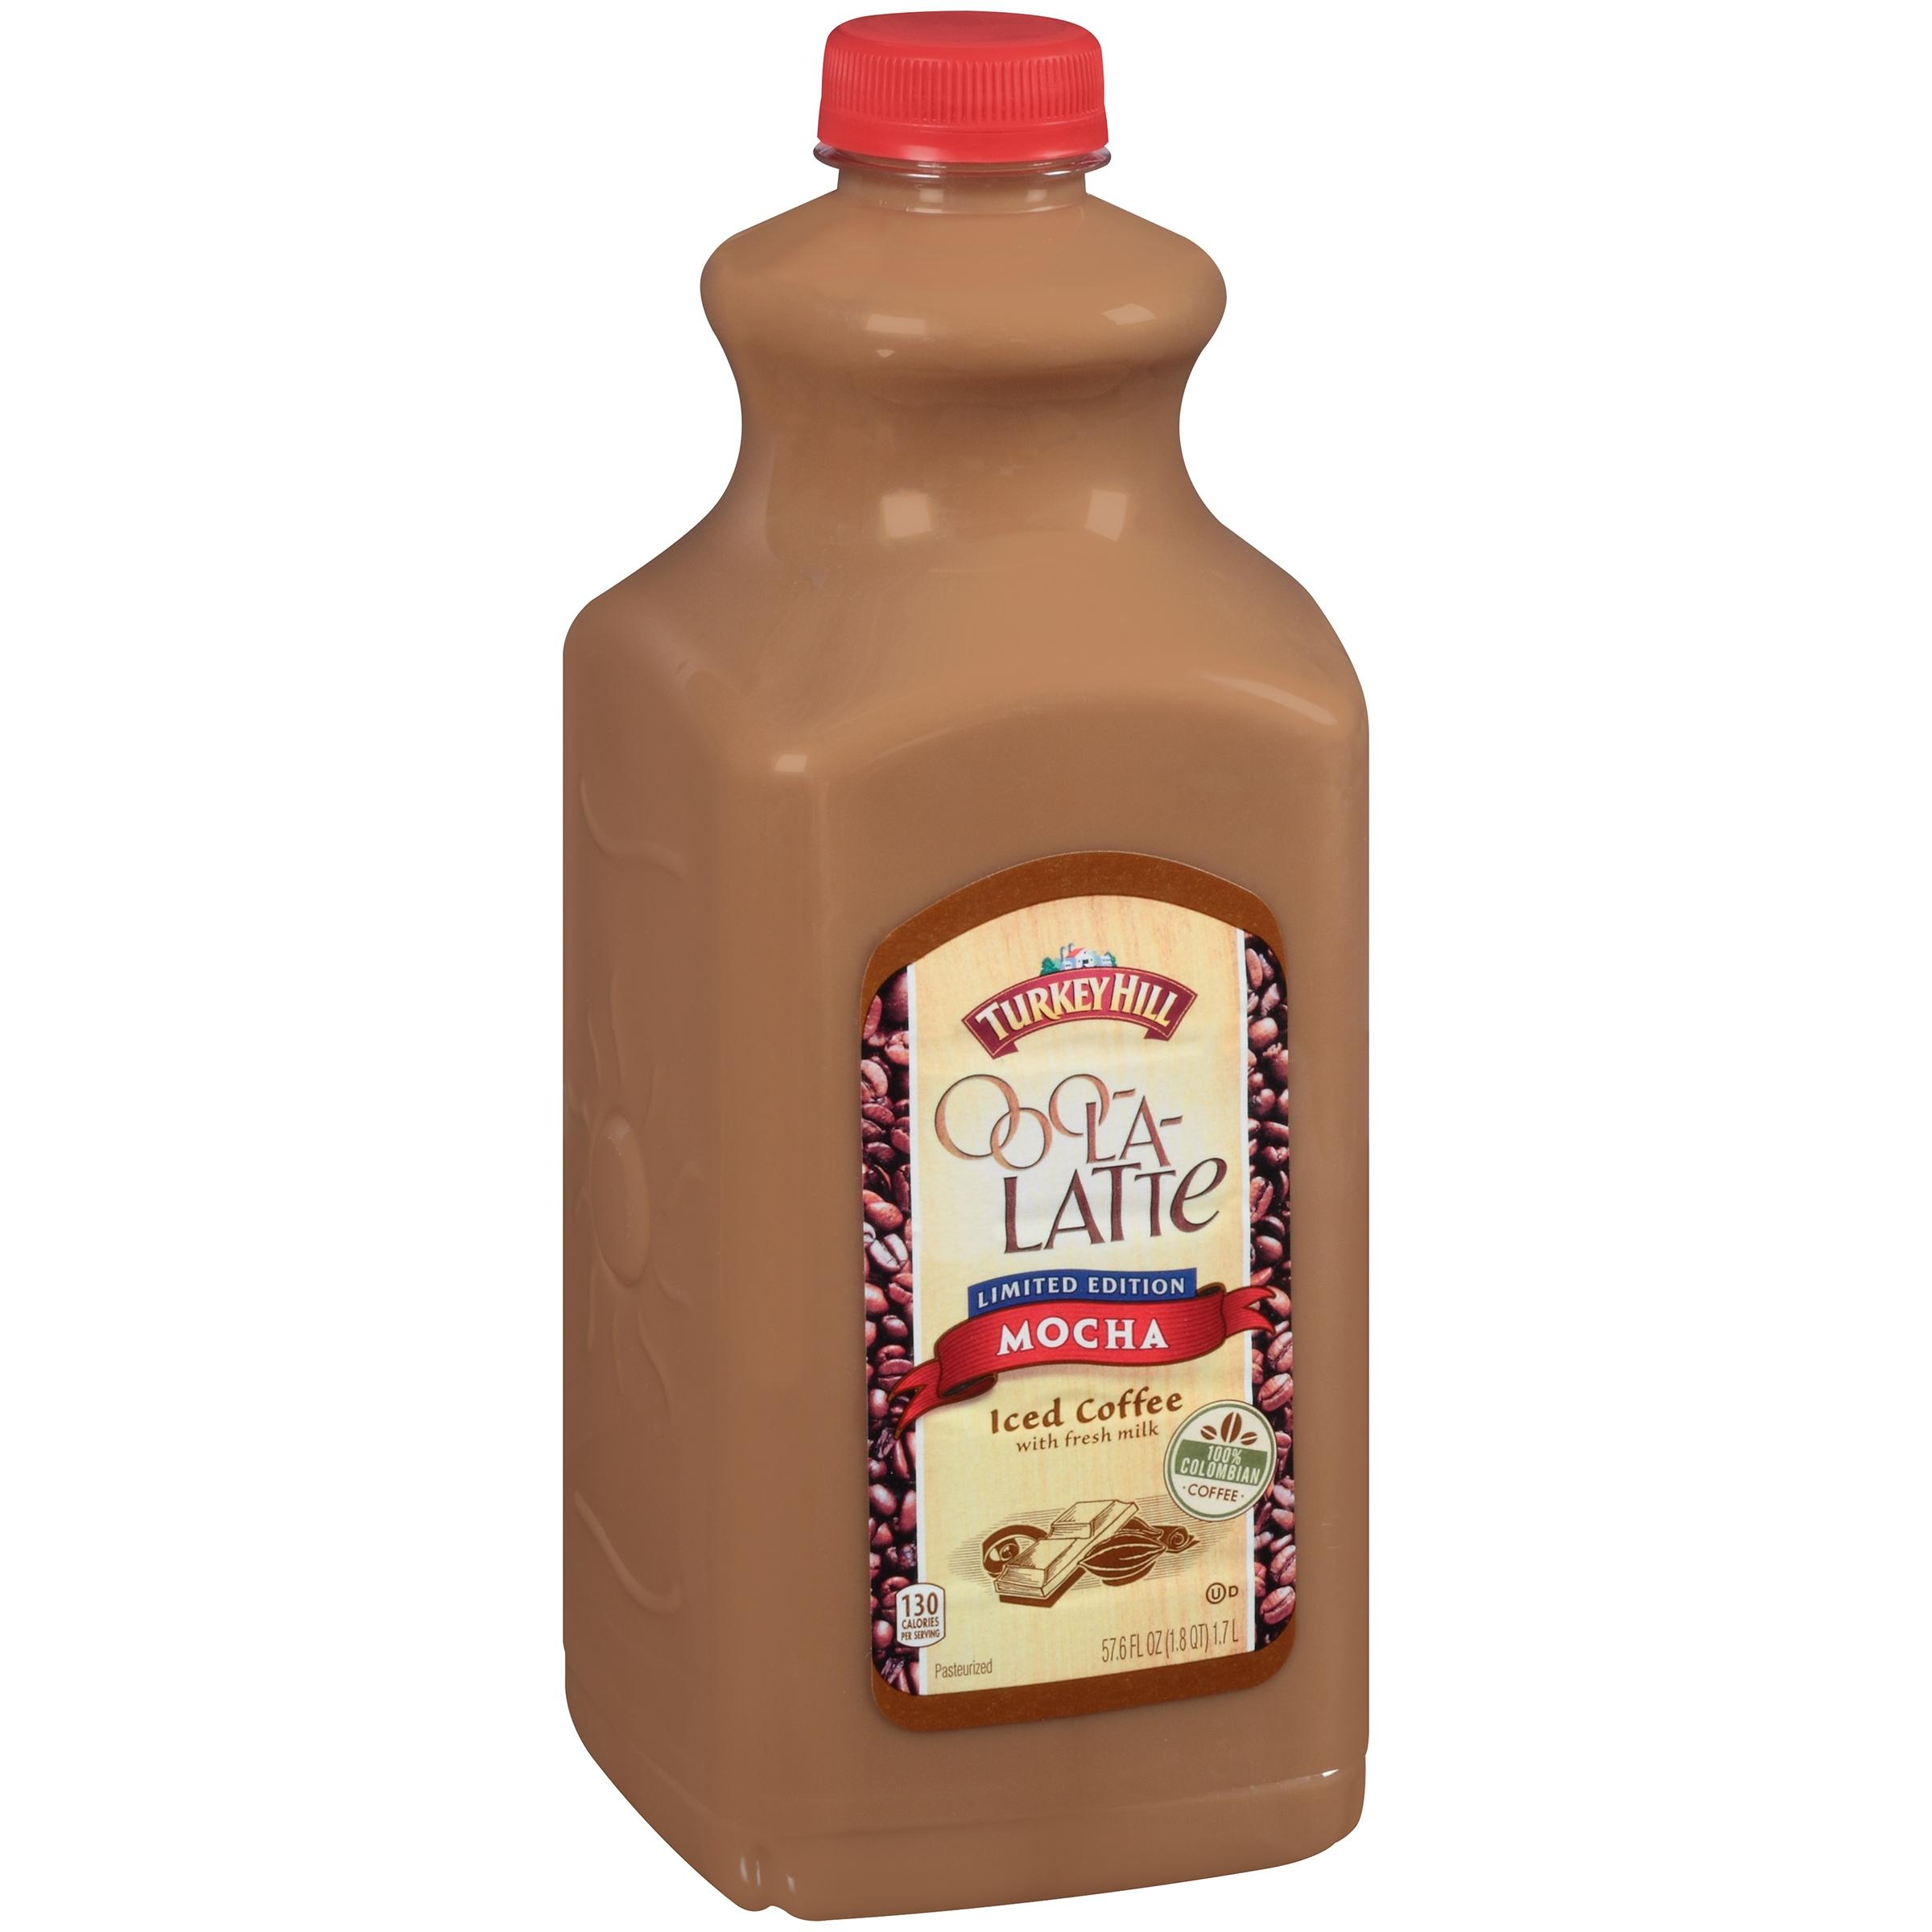 Turkey Hill Ooo-La-Latte Mocha Iced Coffee, 57.6 Fl. Oz.